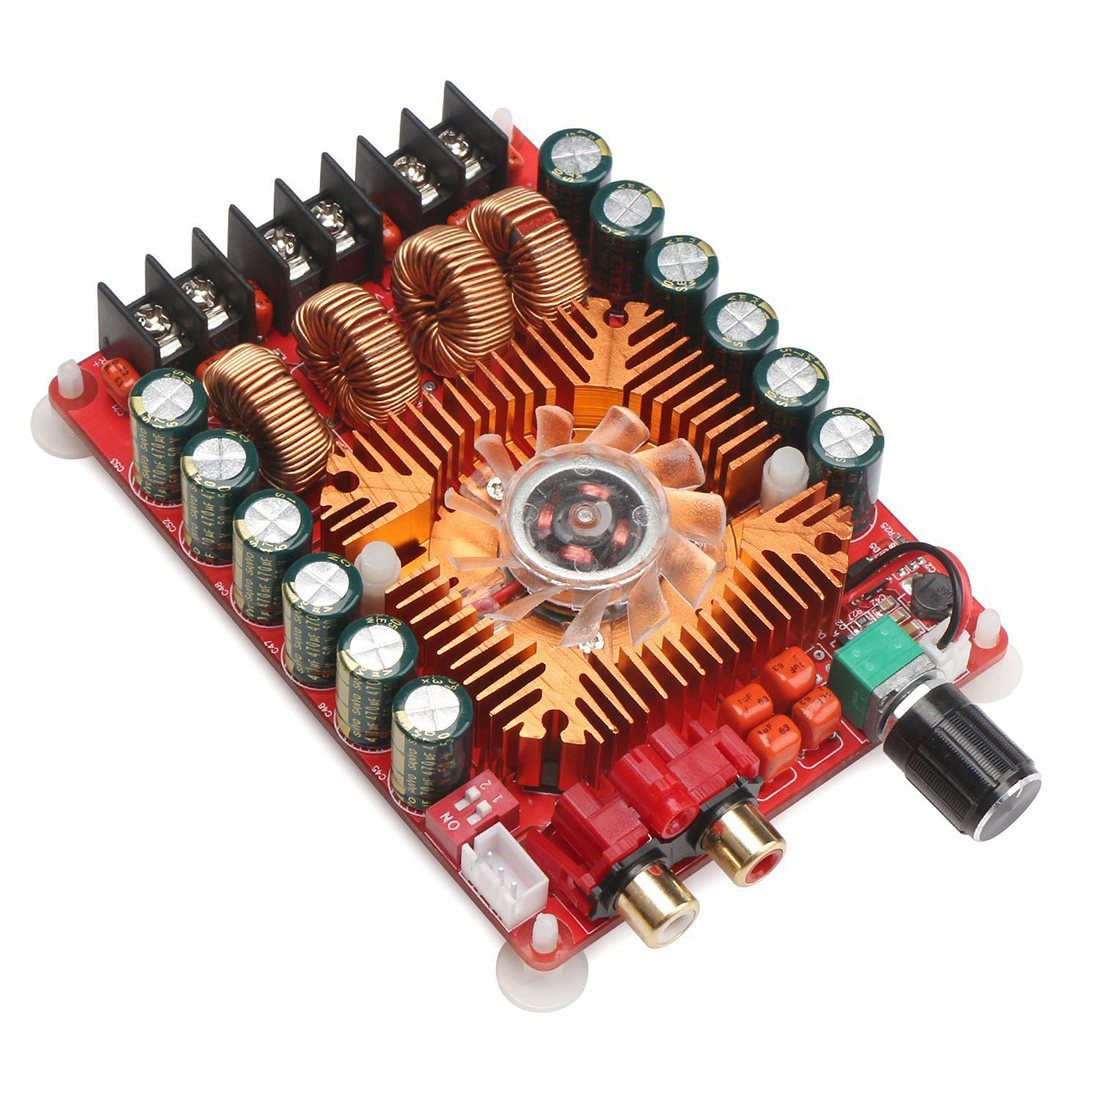 TDA7498E 2X160W Dual Channel Audio Amplifier Board, Support BTL Mode 1X220W Single Channel, DC 24V Digital Stereo Power Module